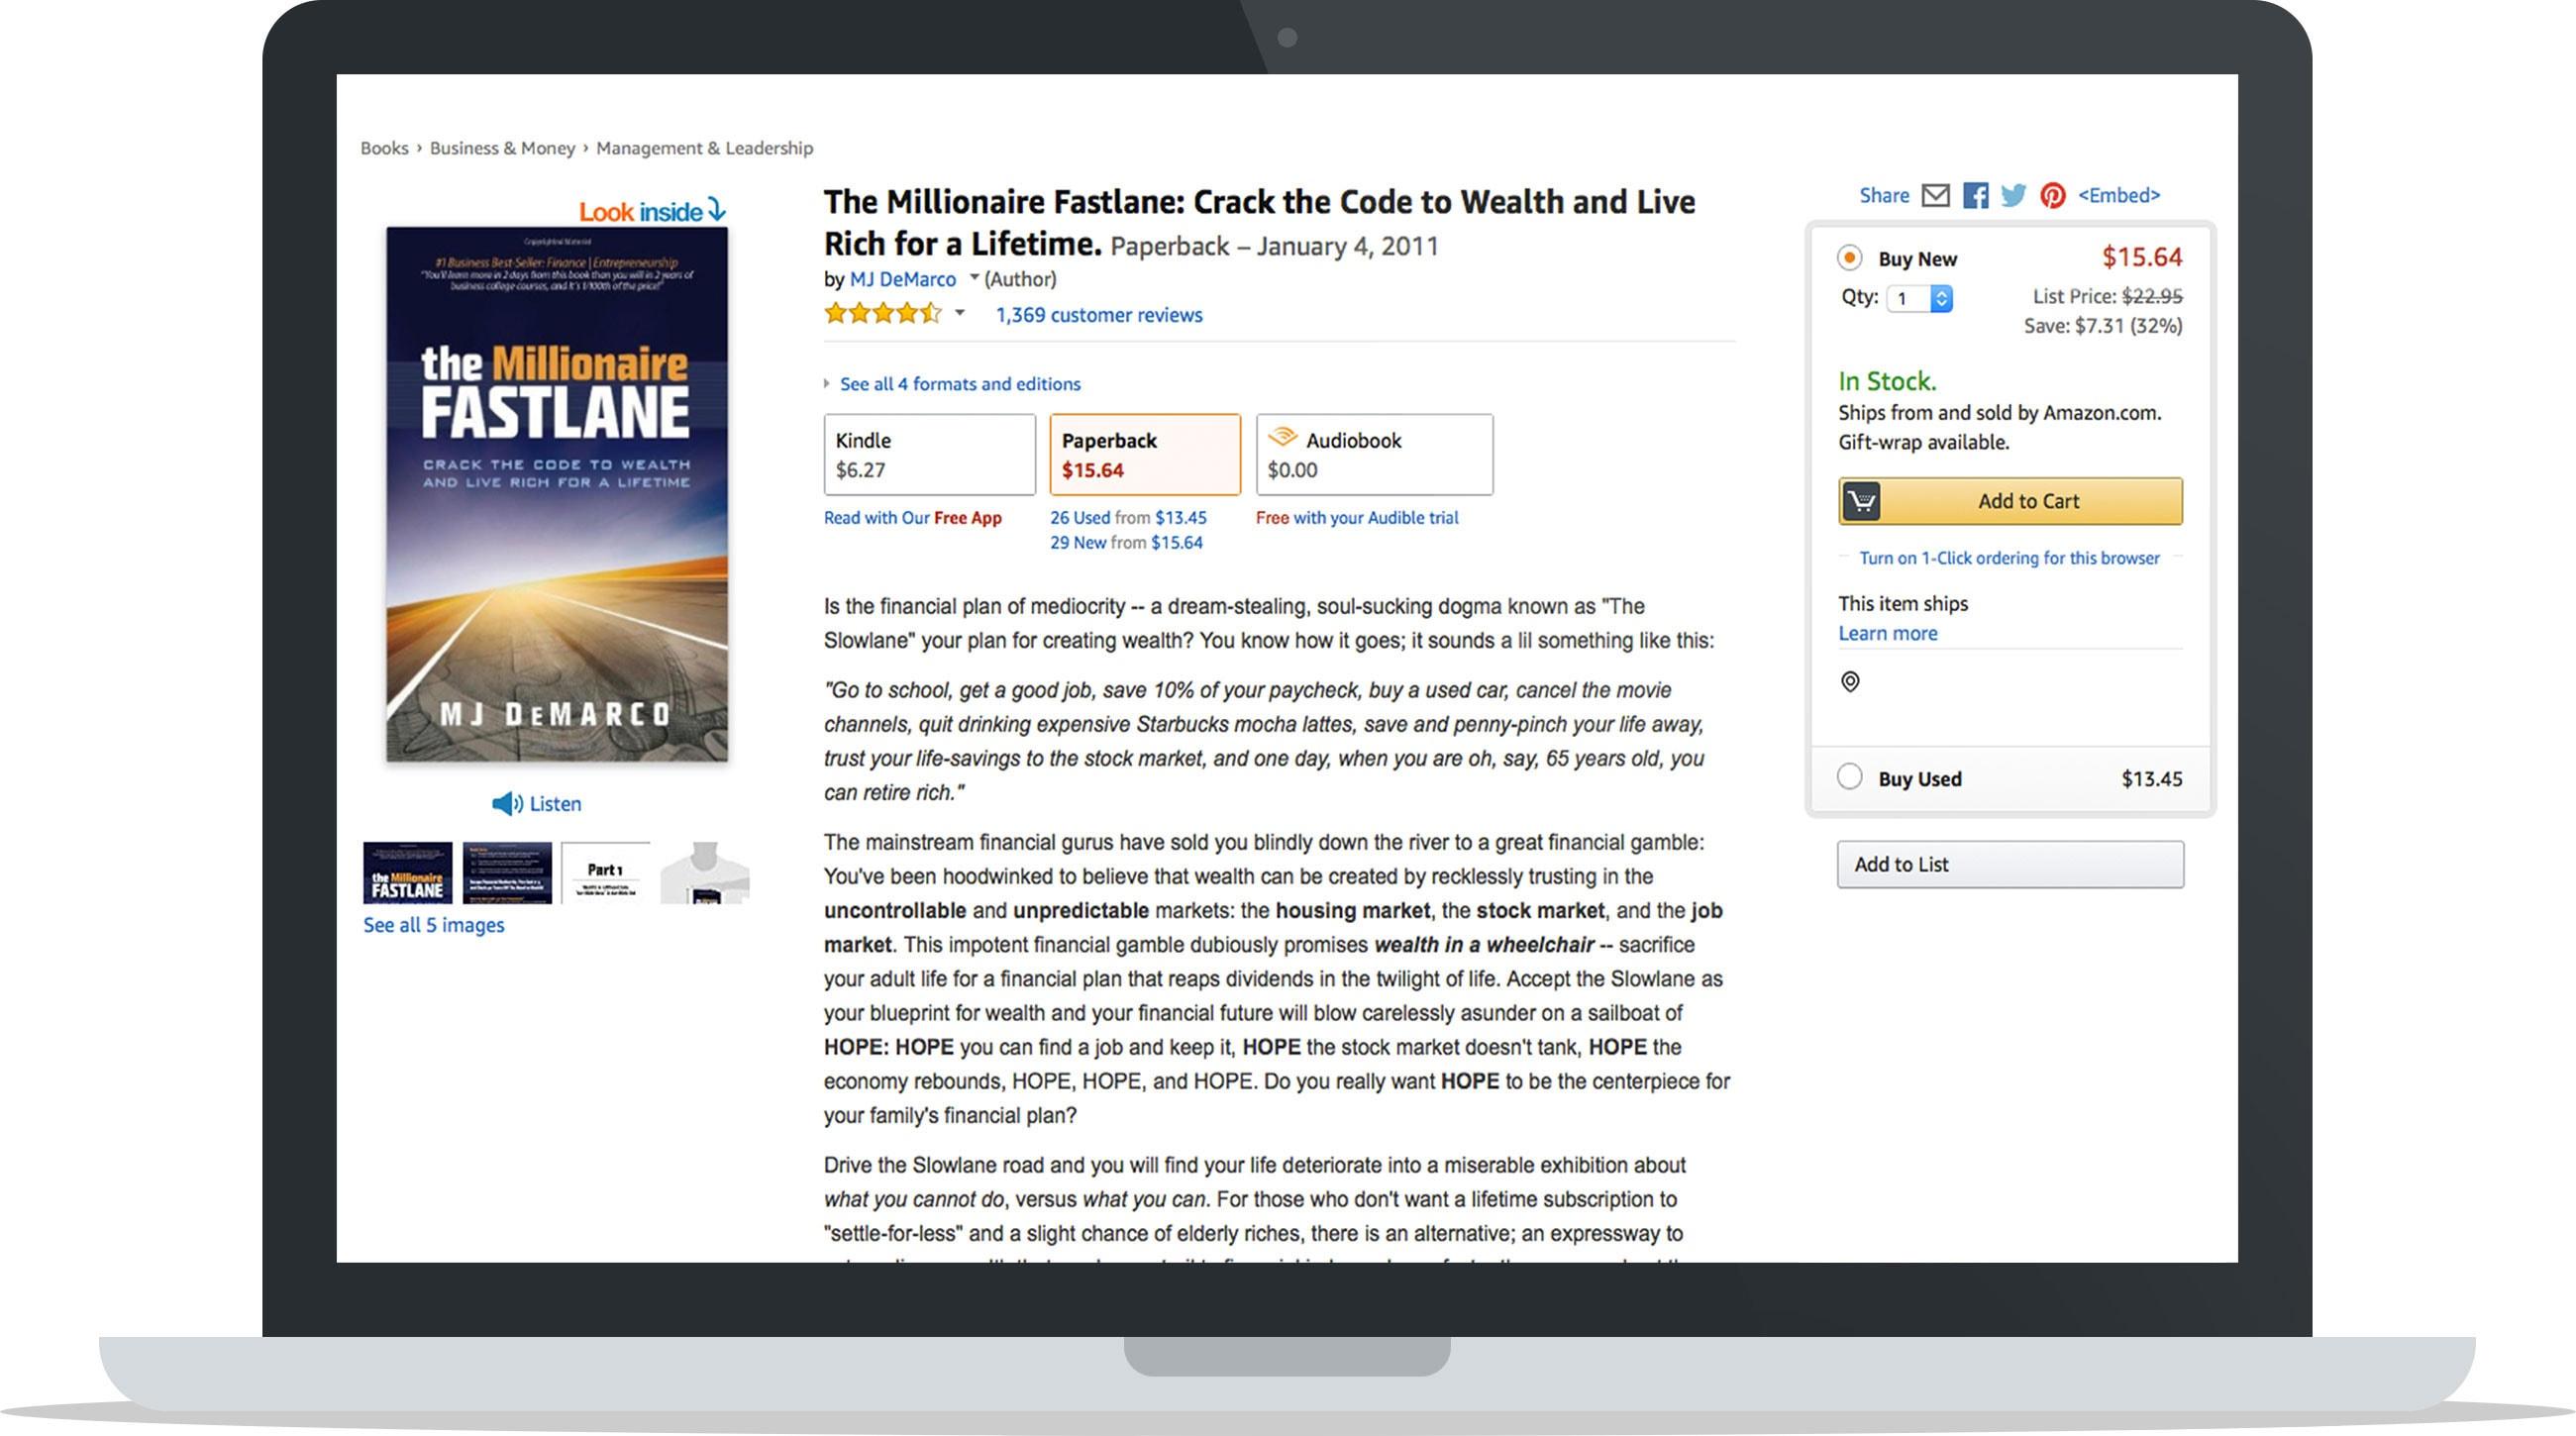 Millionaire Fastlane Ecommerce Business Book